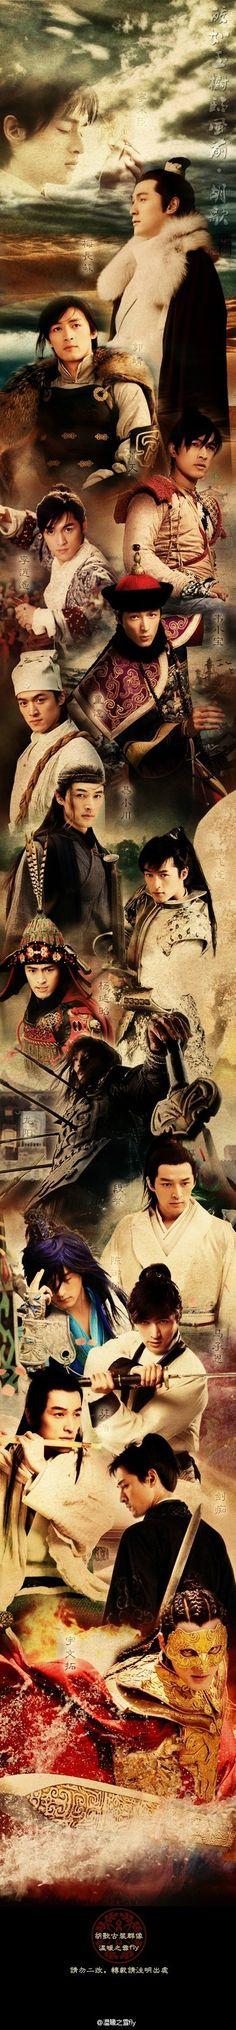 Wuxia characters